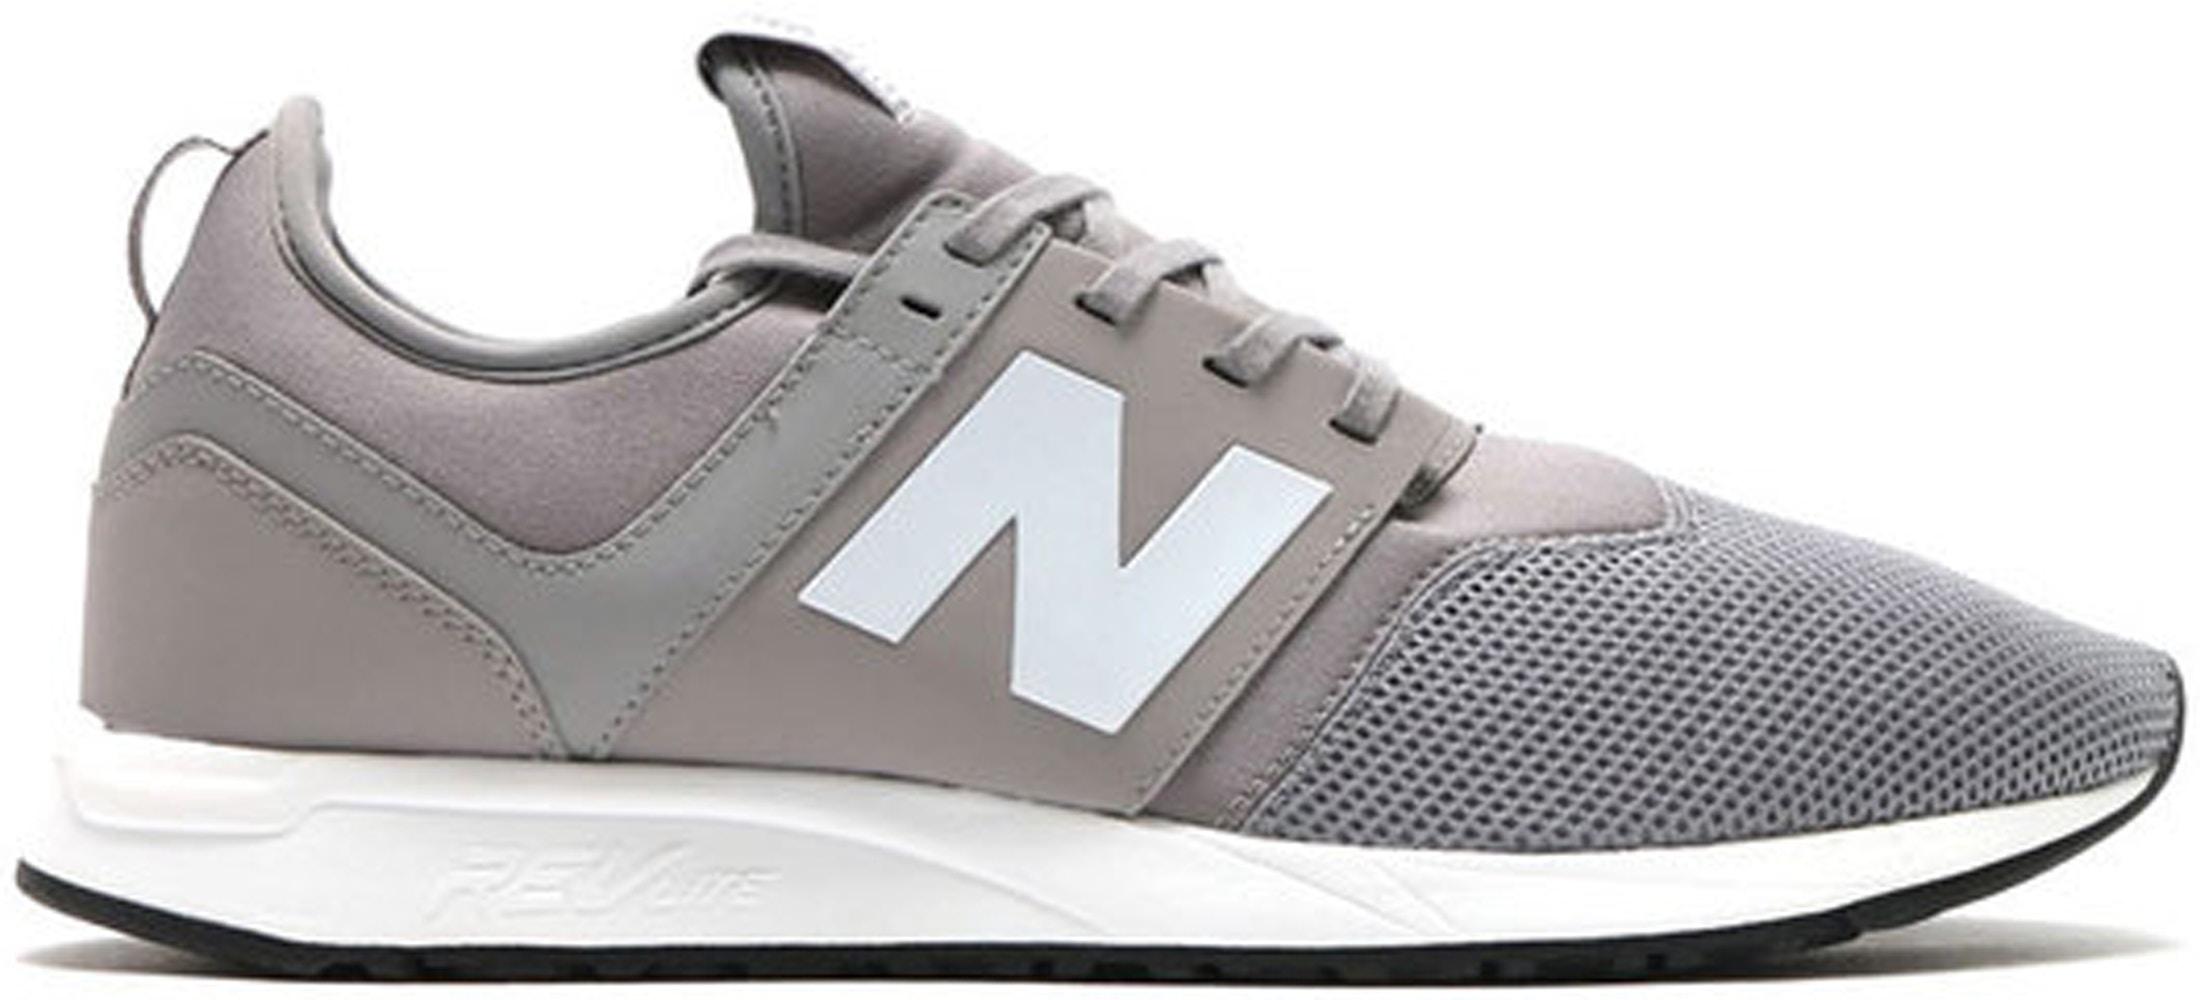 New Balance 247 Classic Grey White